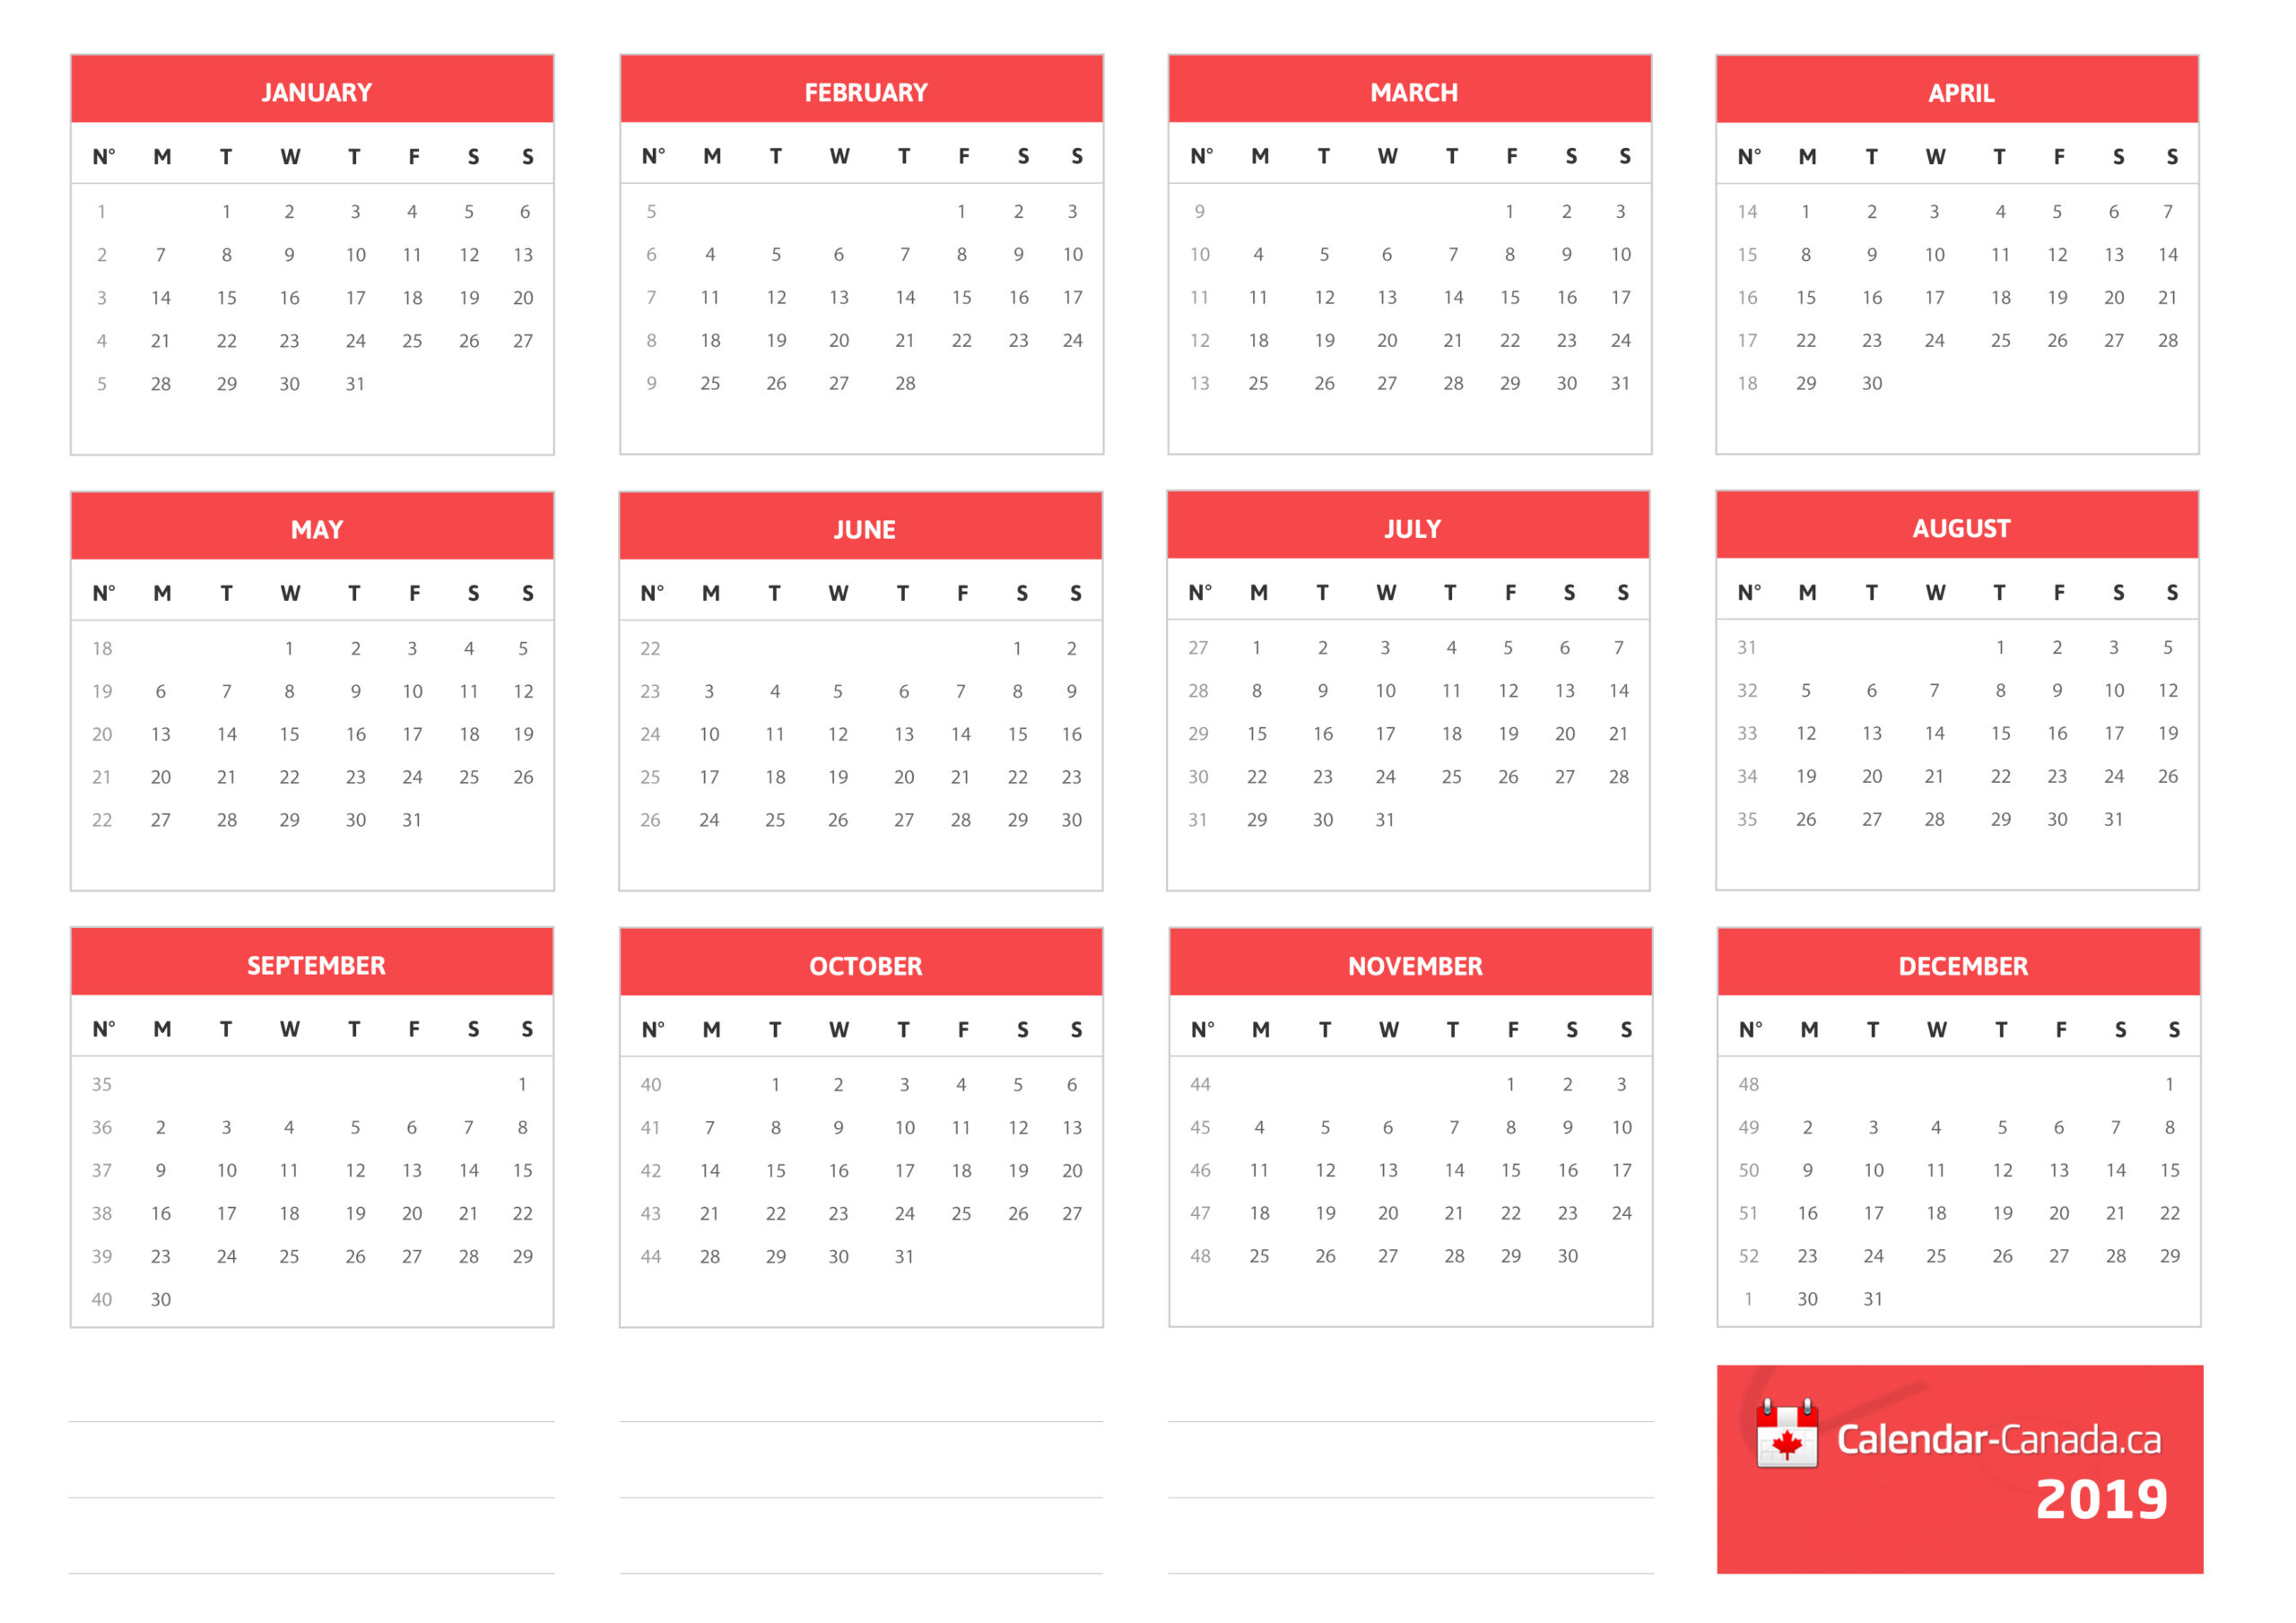 2021 Holidays Canada - Statutory, National & Local Holidays